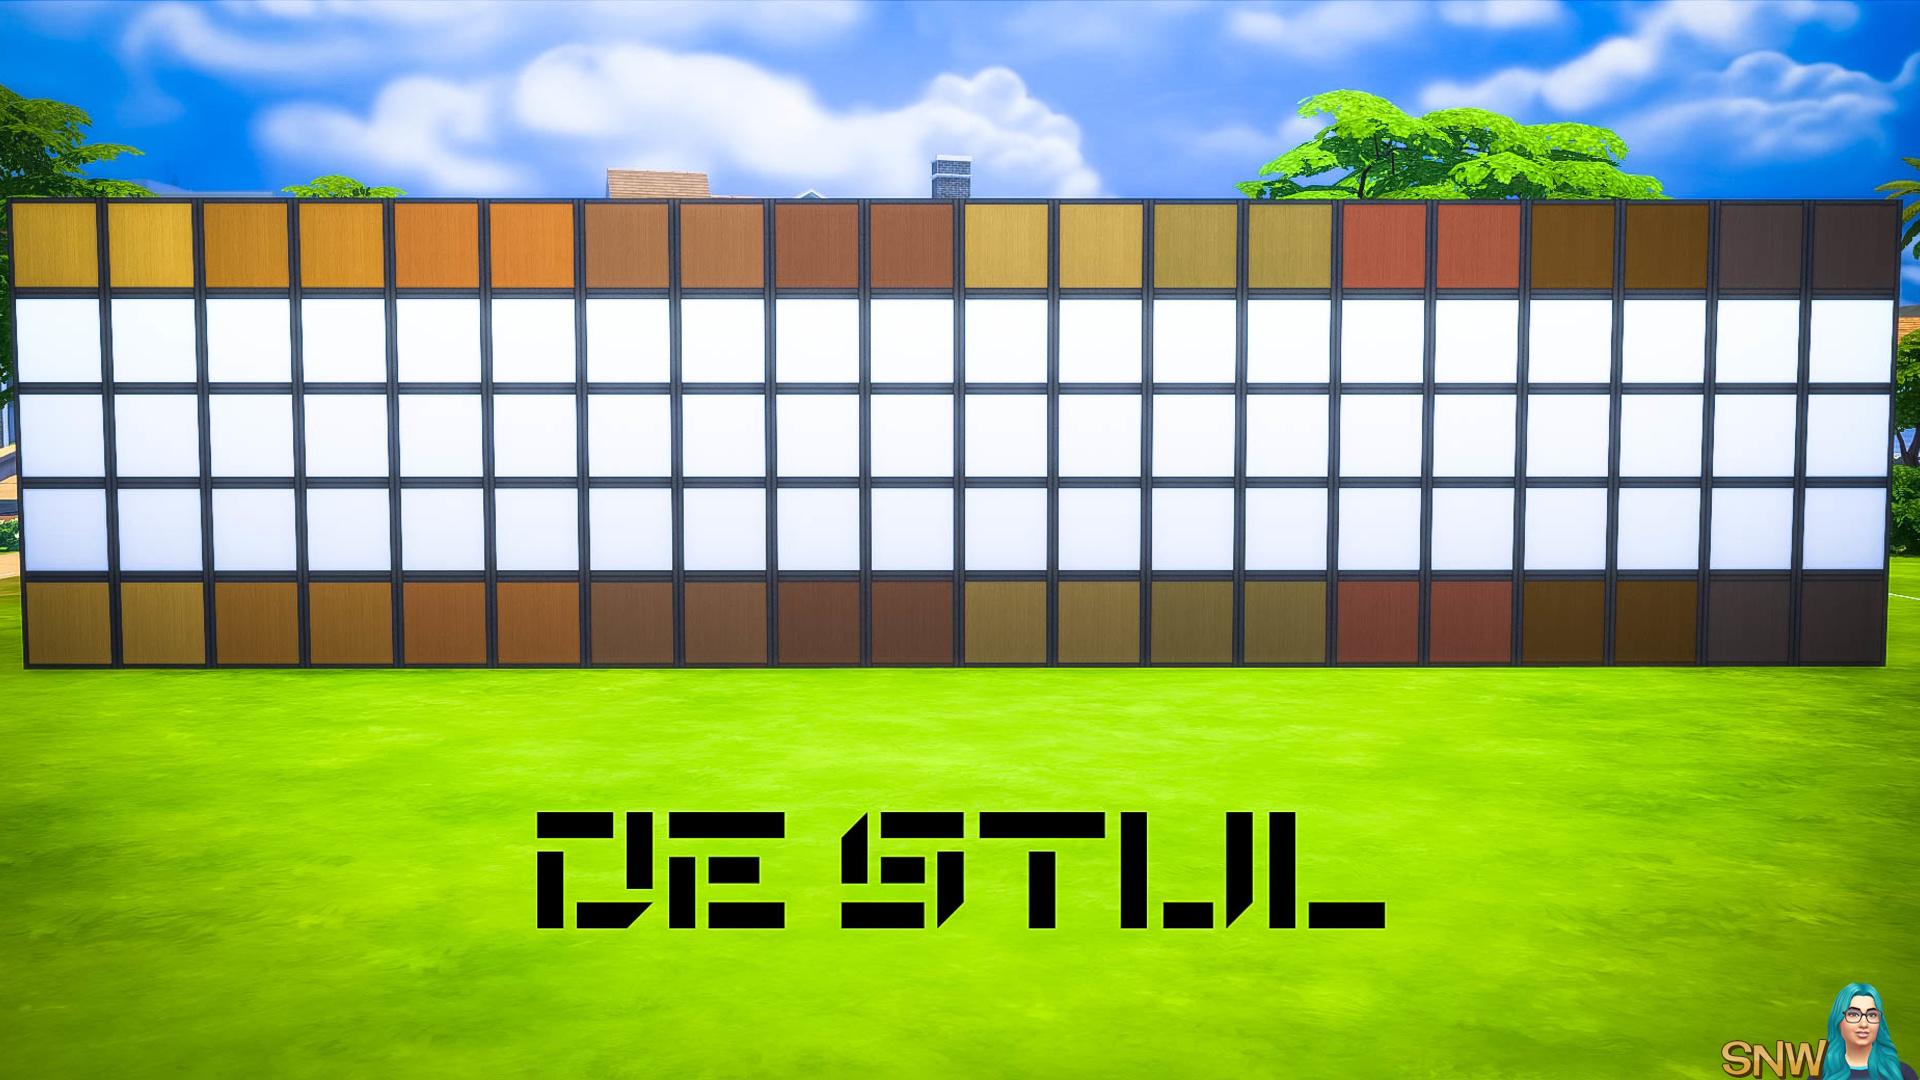 De Stijl Wooden Wall Panels Blocks (Top and Bottom) #10